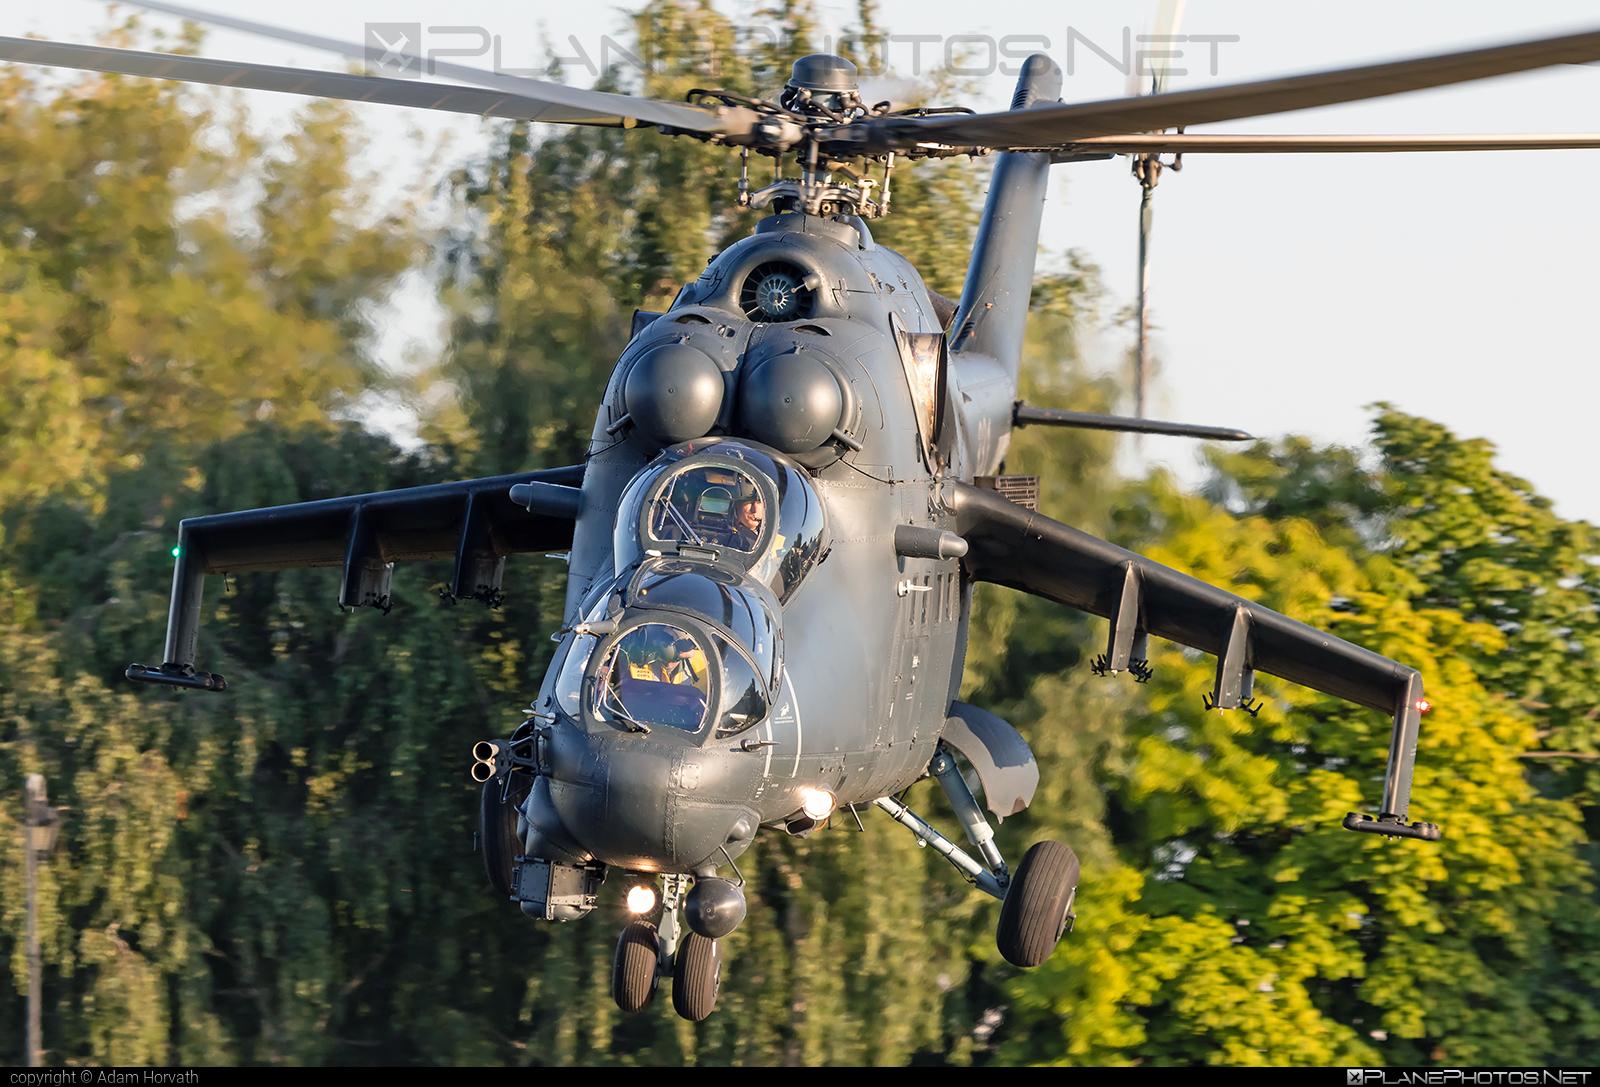 Mil Mi-24P - 331 operated by Magyar Légierő (Hungarian Air Force) #hungarianairforce #magyarlegiero #mi24 #mi24p #mil #mil24 #mil24p #milhelicopters